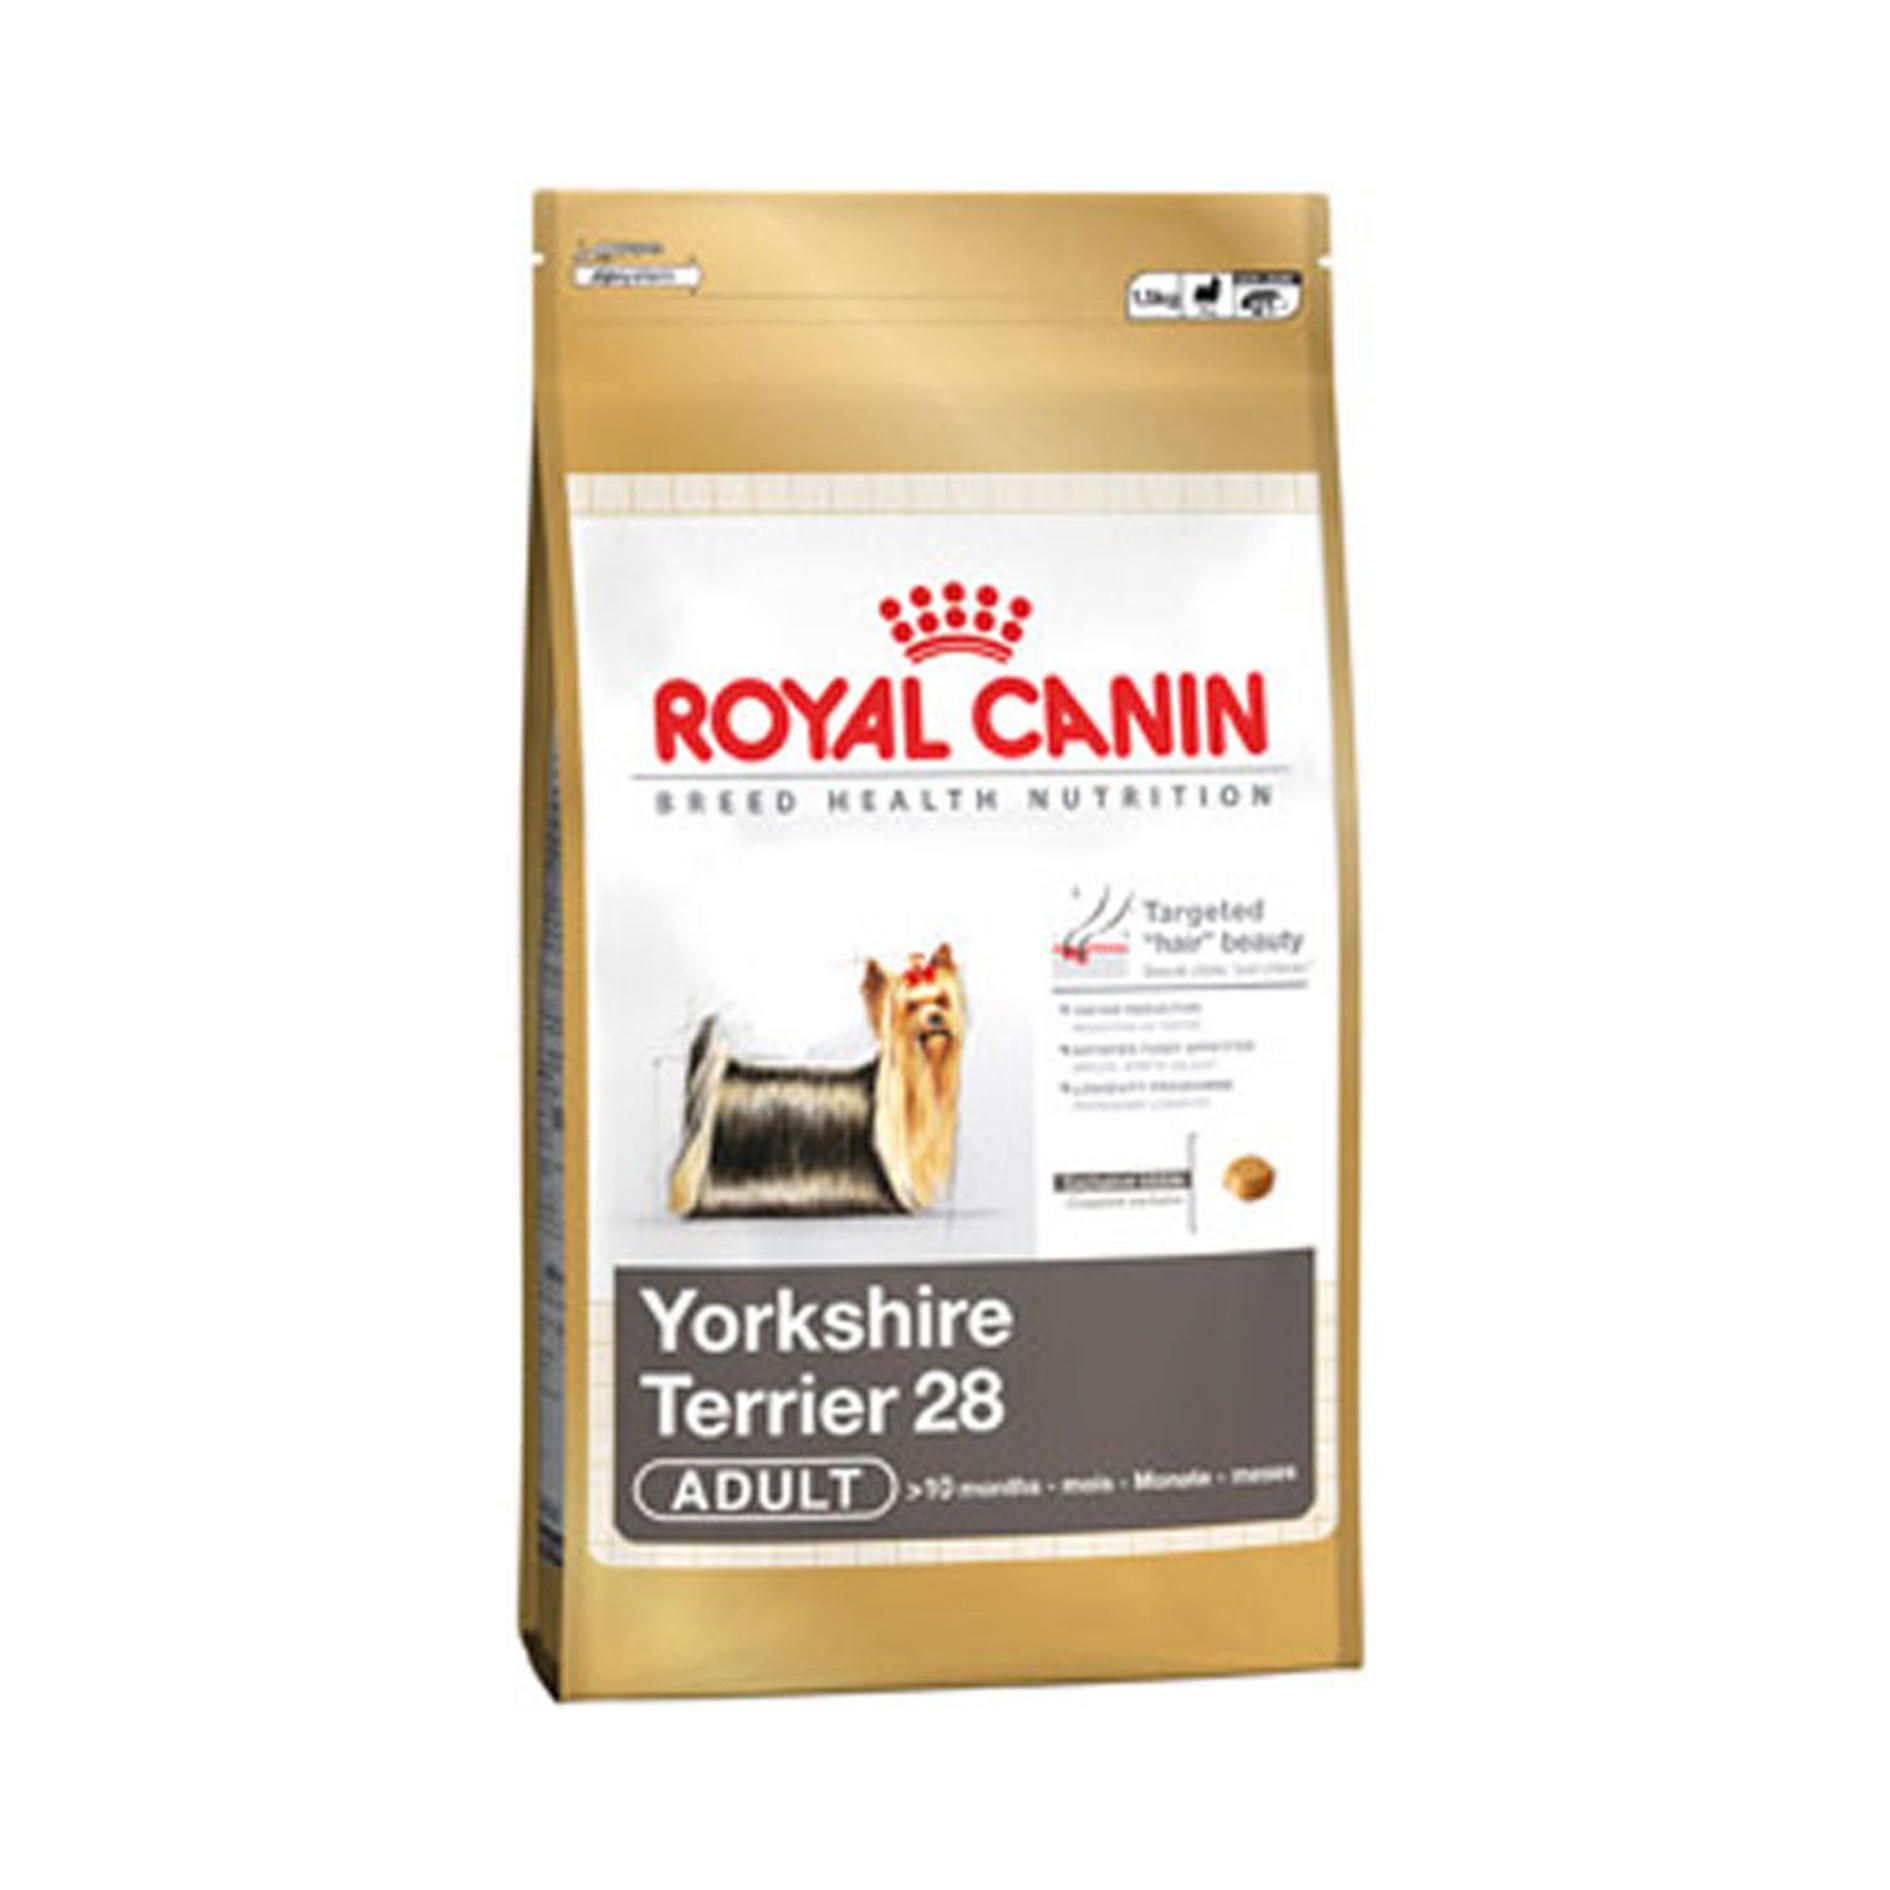 Royal Canin Breed Health Nutrition Yorkshire Terrier 28 Yorkshire Terrier Terrier Yorkshire